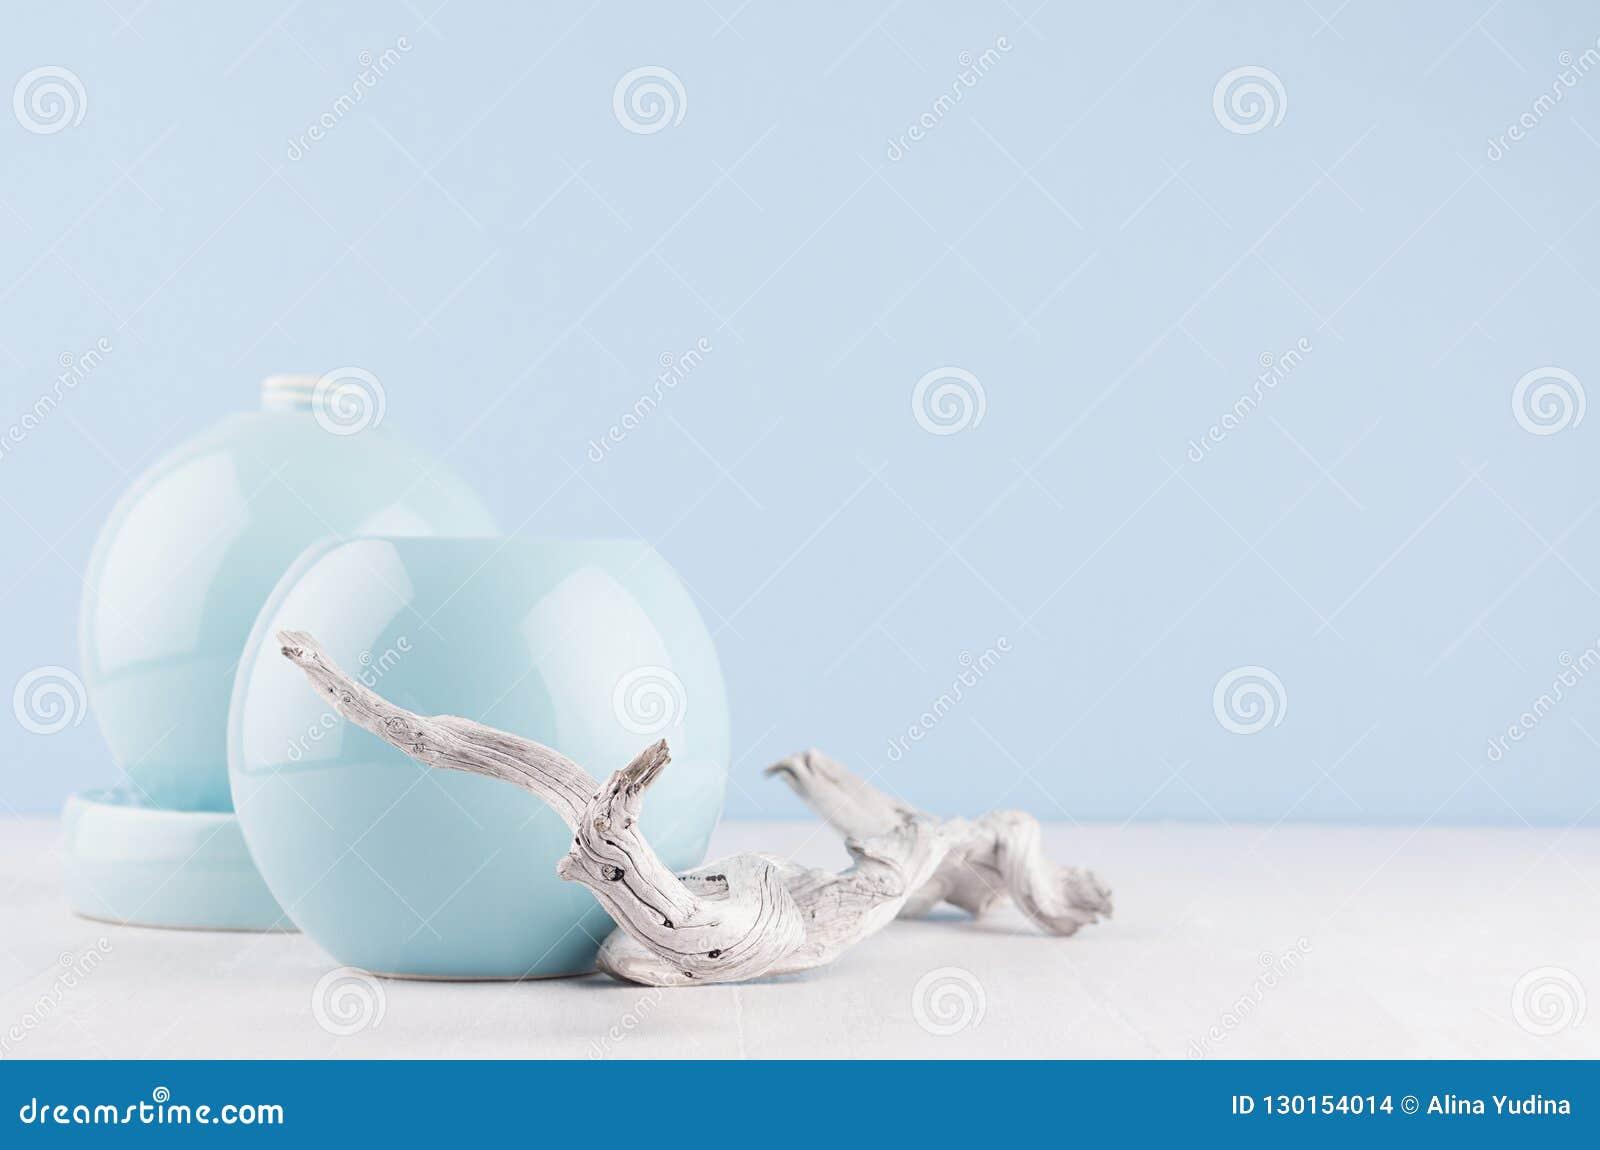 Fashion home decor in modern elegant japanese style - light soft blue ceramic vases and old shabby branch on white wood background